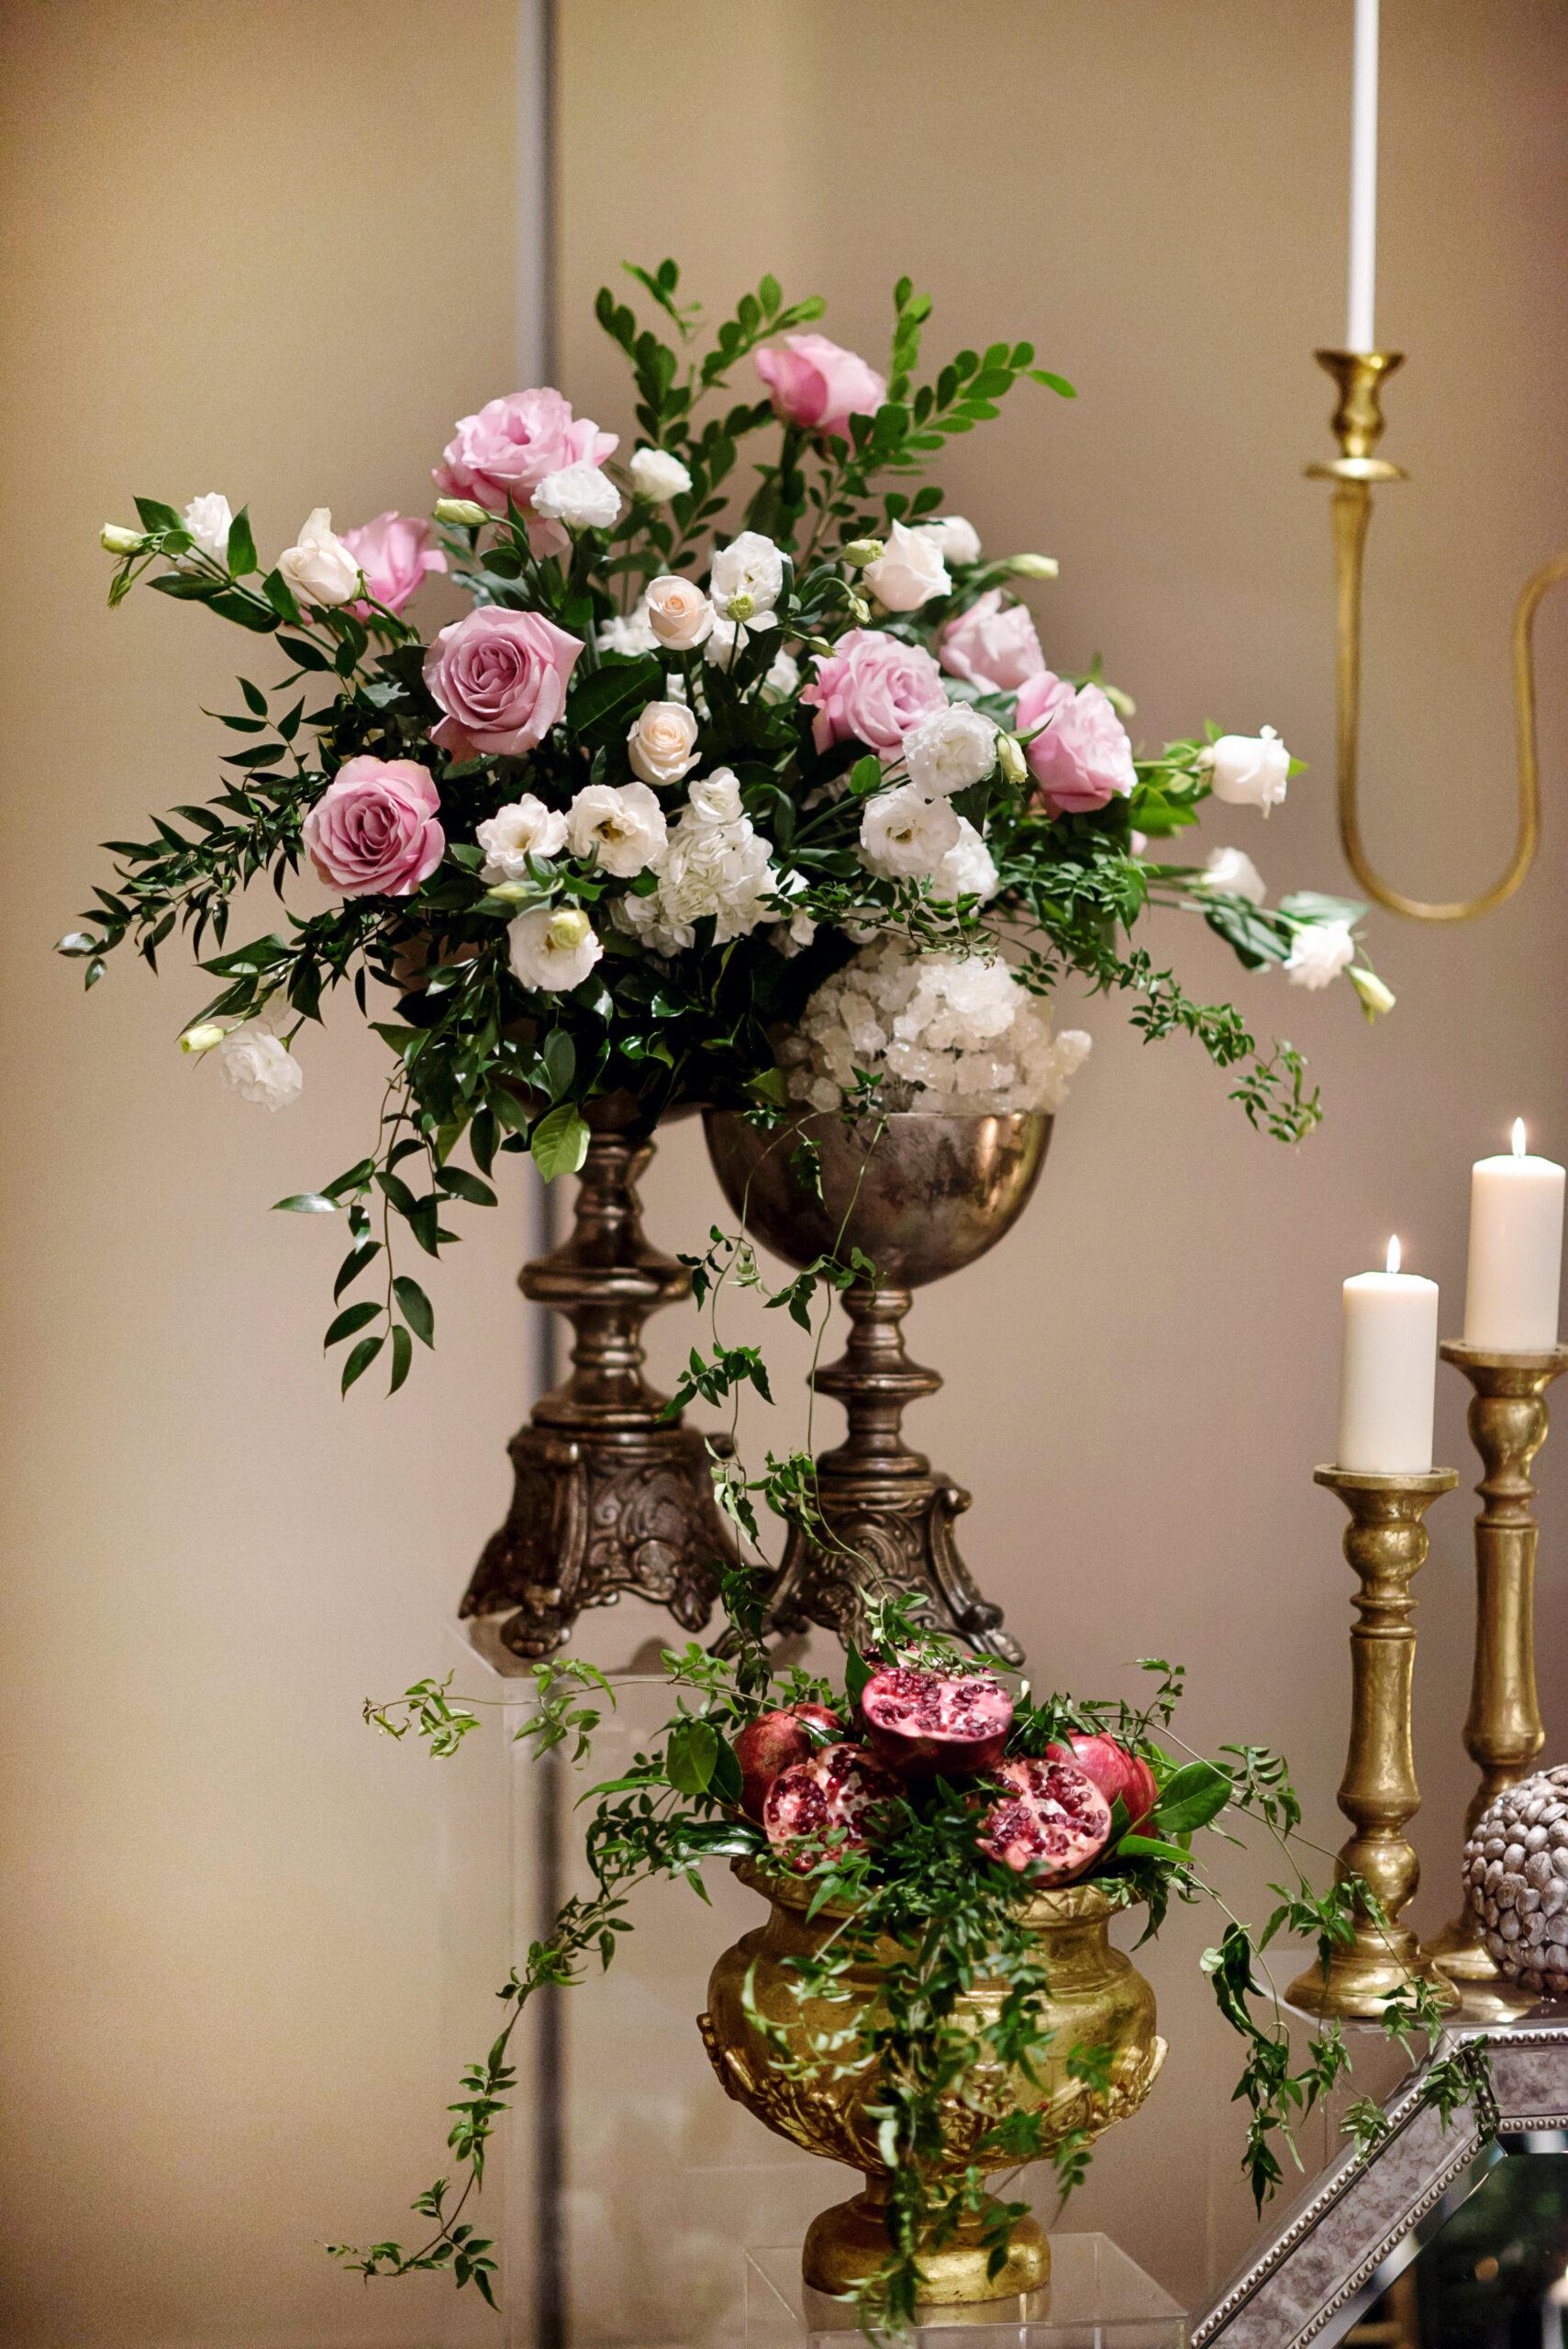 https://secureservercdn.net/45.40.145.151/kgq.ab5.myftpupload.com/wp-content/uploads/2020/04/Sanam-Soroush-s-Wedding-wedluxe-submission-0043-scaled.jpg?time=1600462602